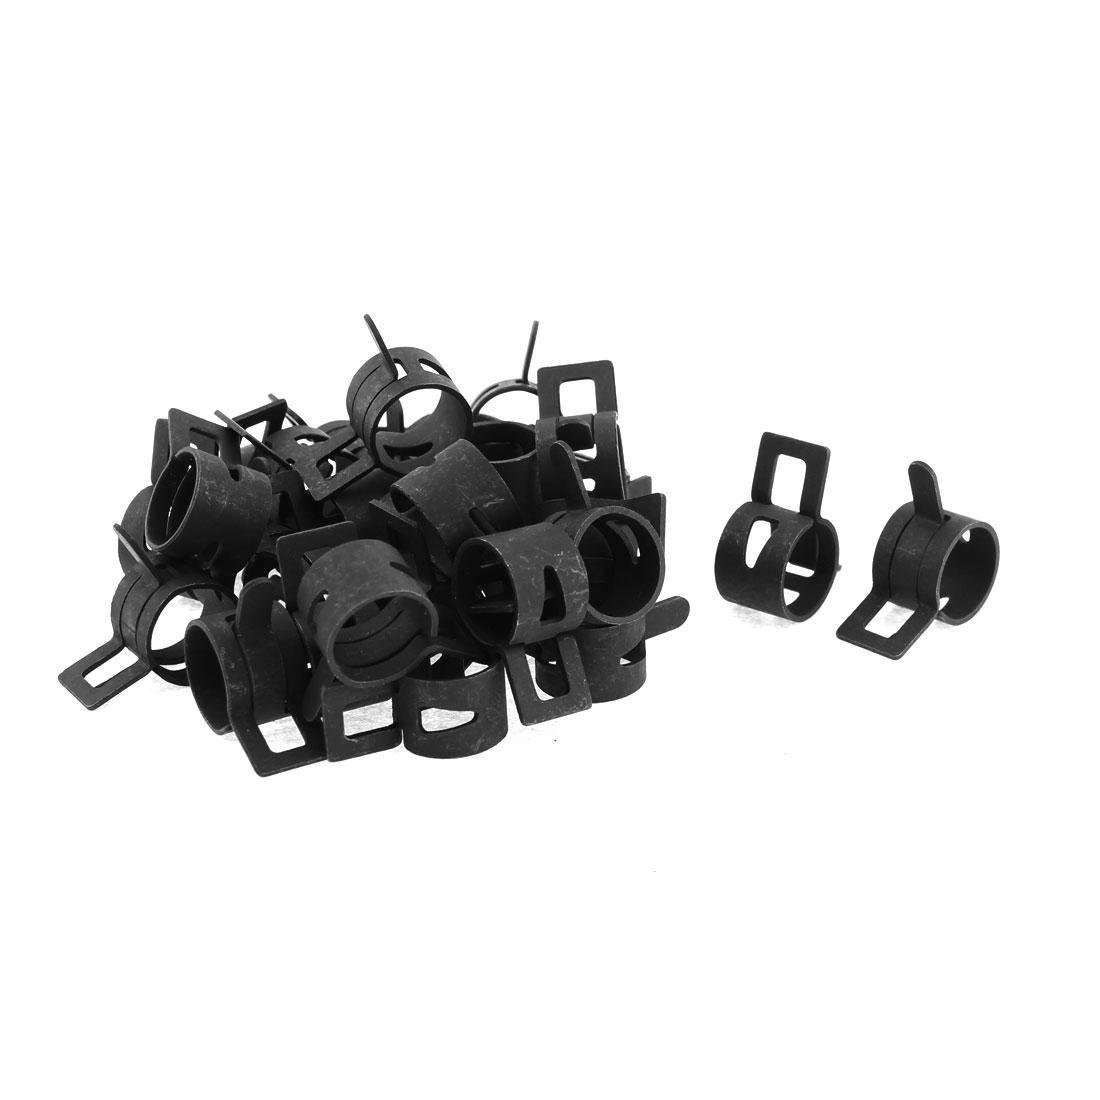 30 Pcs Black Fuel Oil Hose Metal Spring Clip Clamps